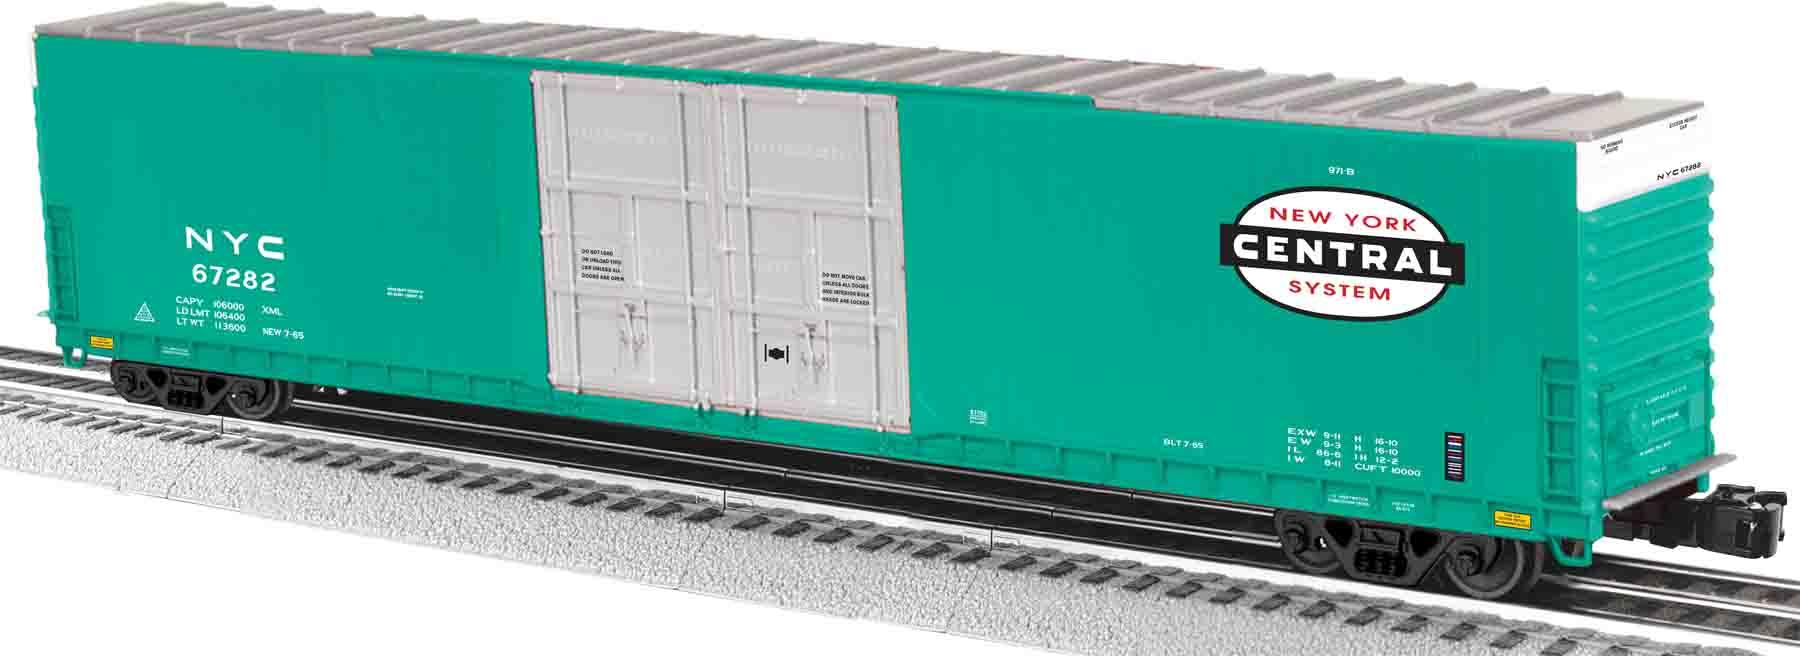 Lionel Lights Diagram Schematics Wiring Diagrams 1122 Switch Car Spotlight Battery Odicis Locomotive E 2343